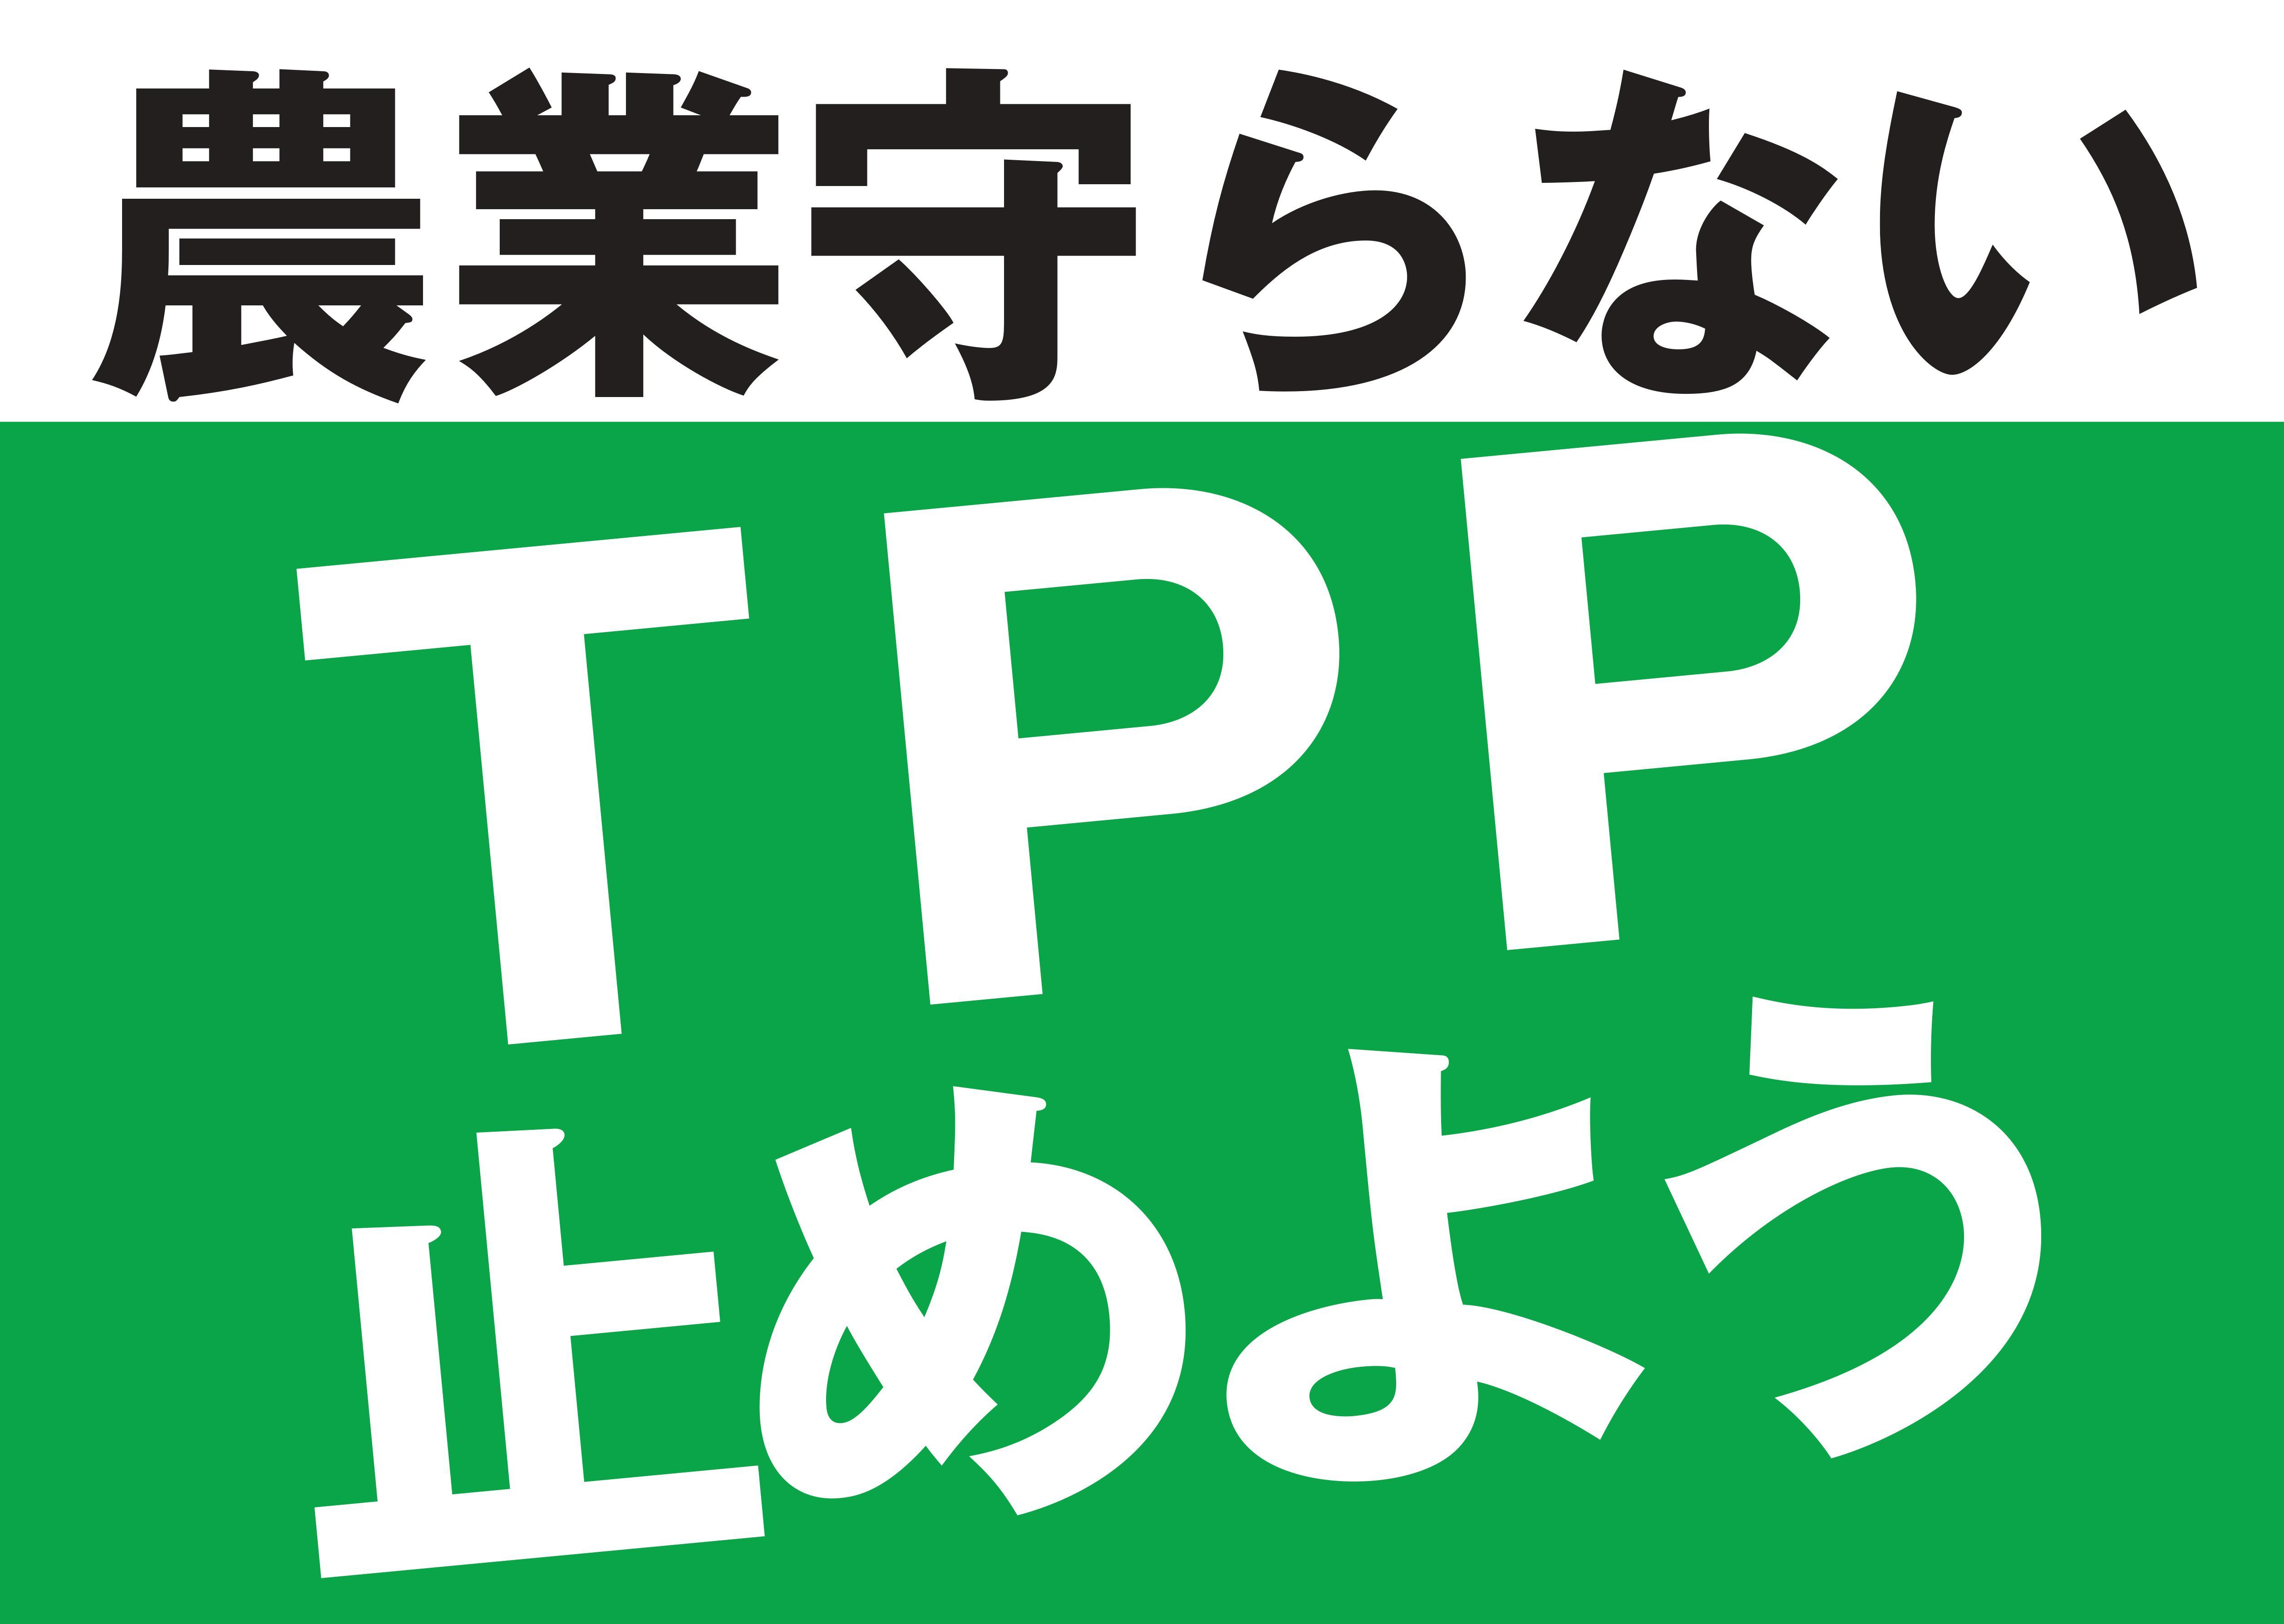 tpp_5